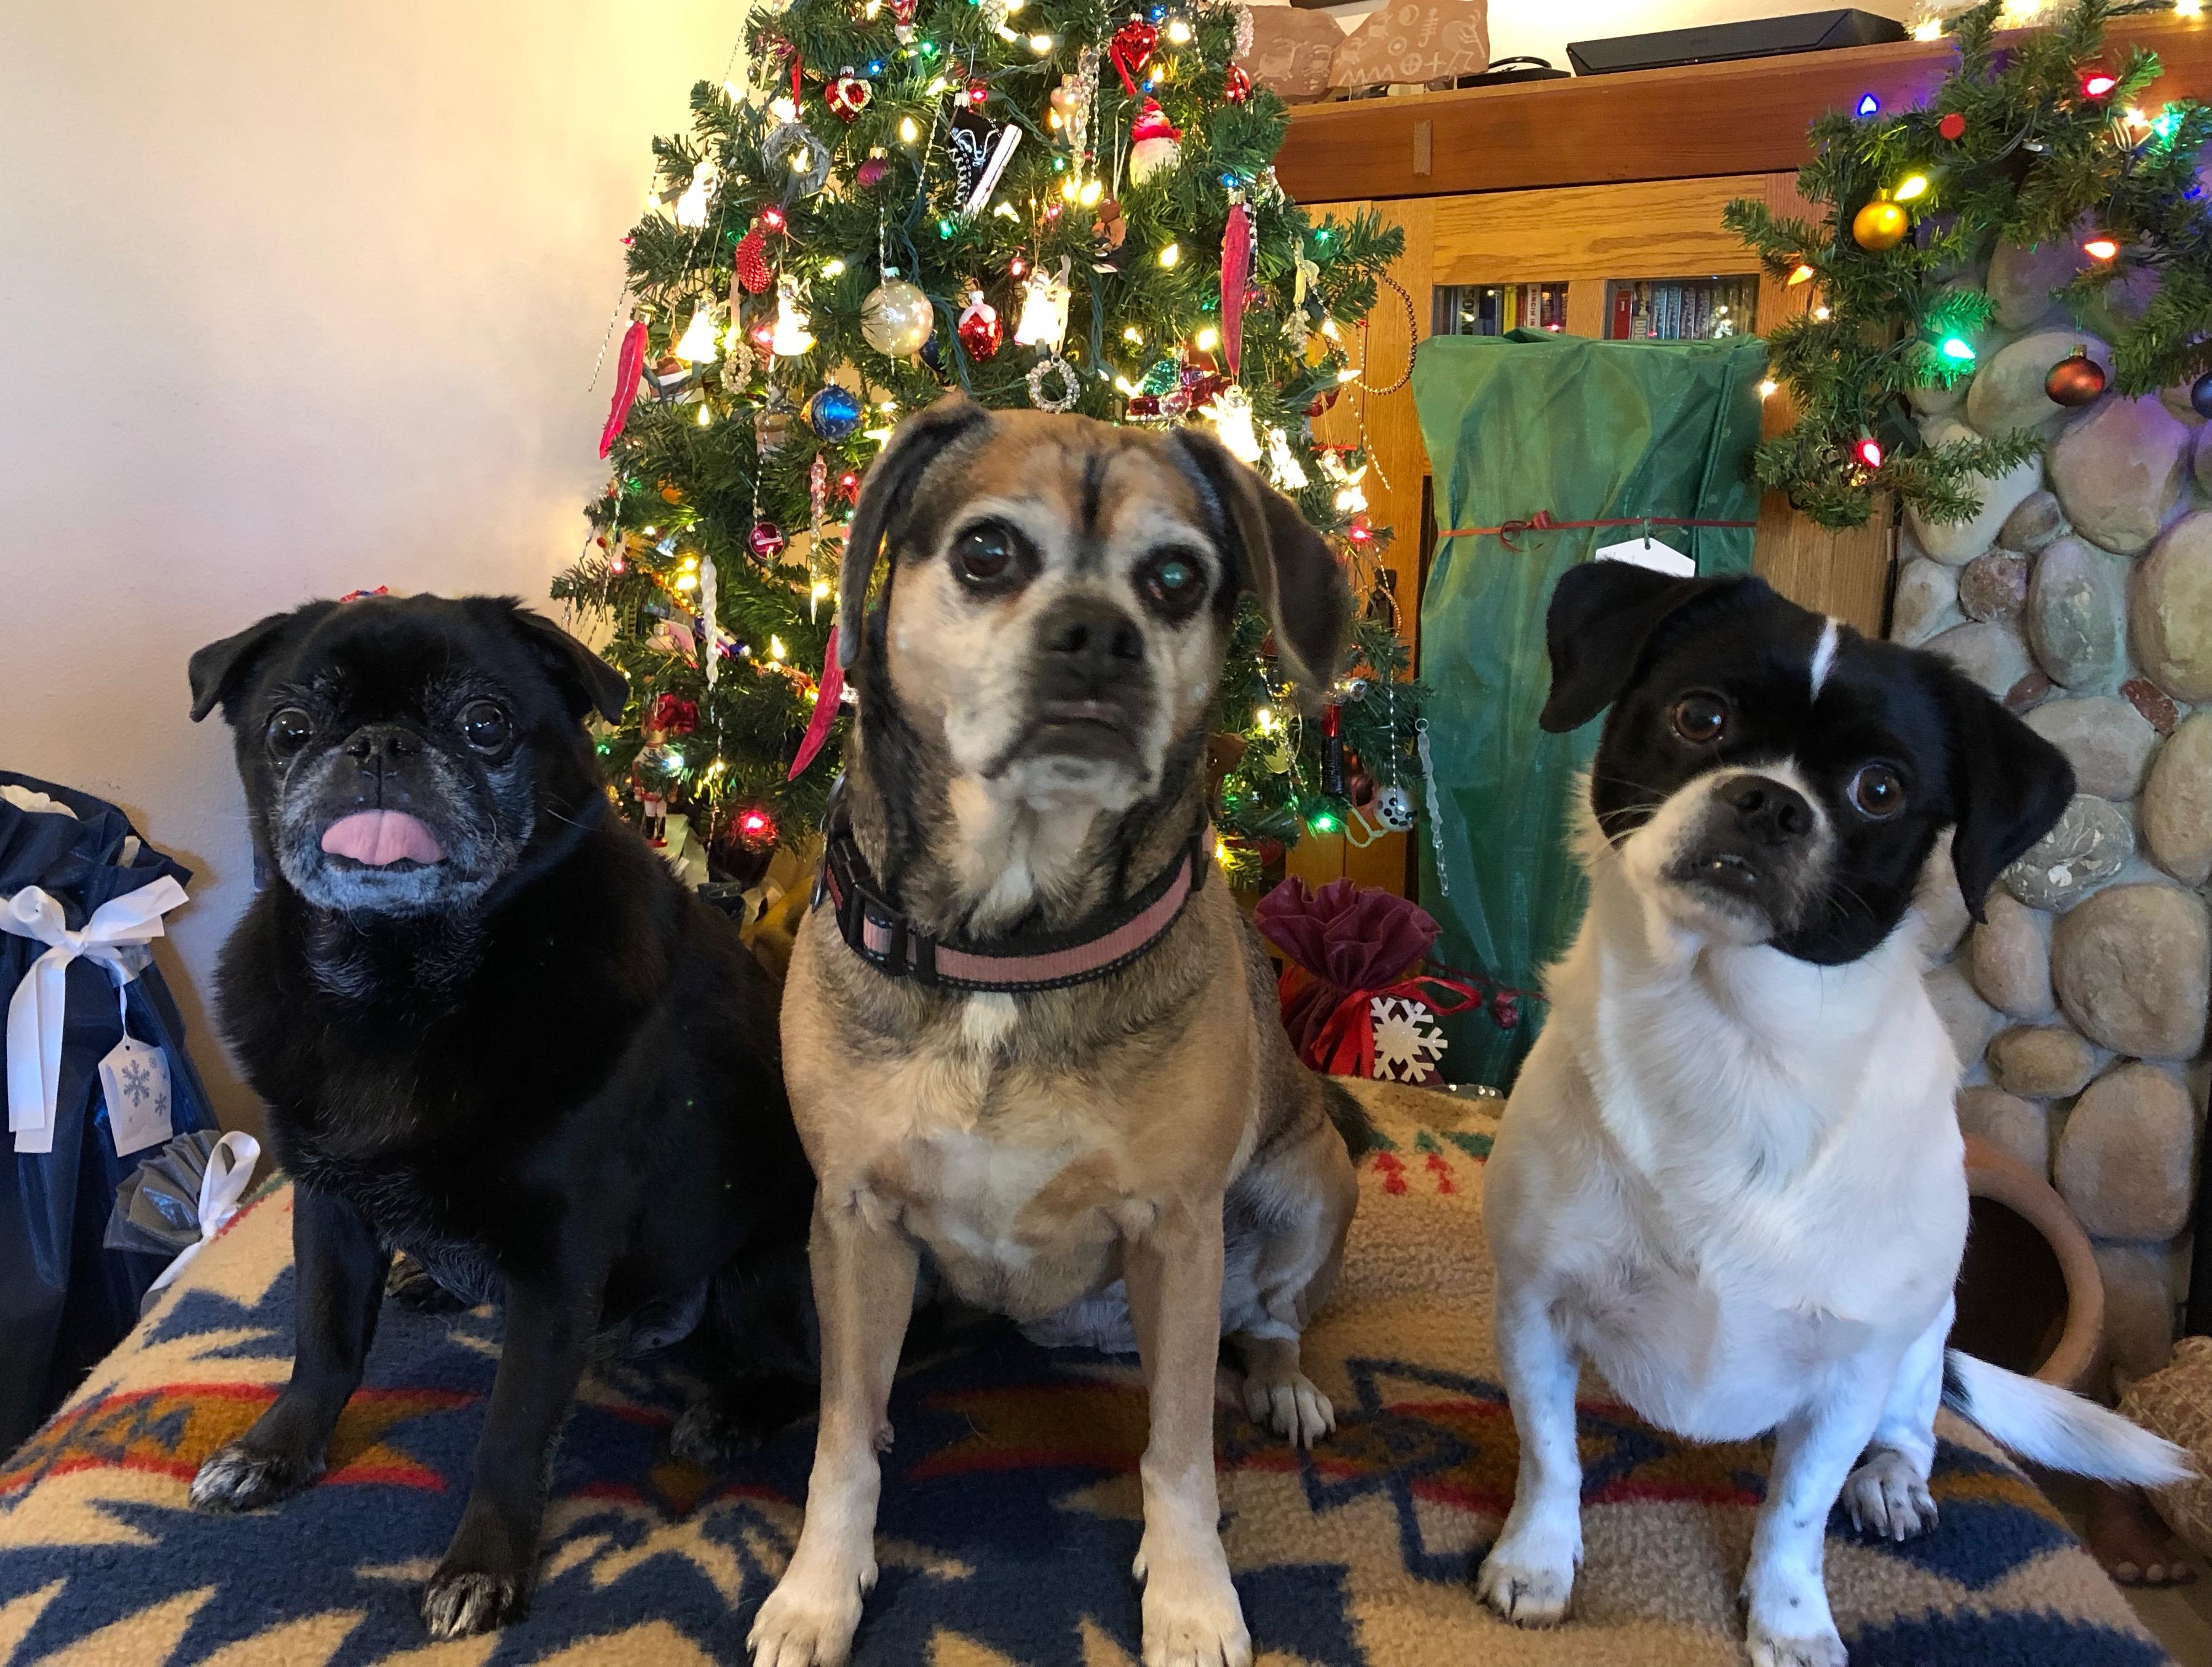 PugPugglePugMutt-Christmas-2018.jpeg